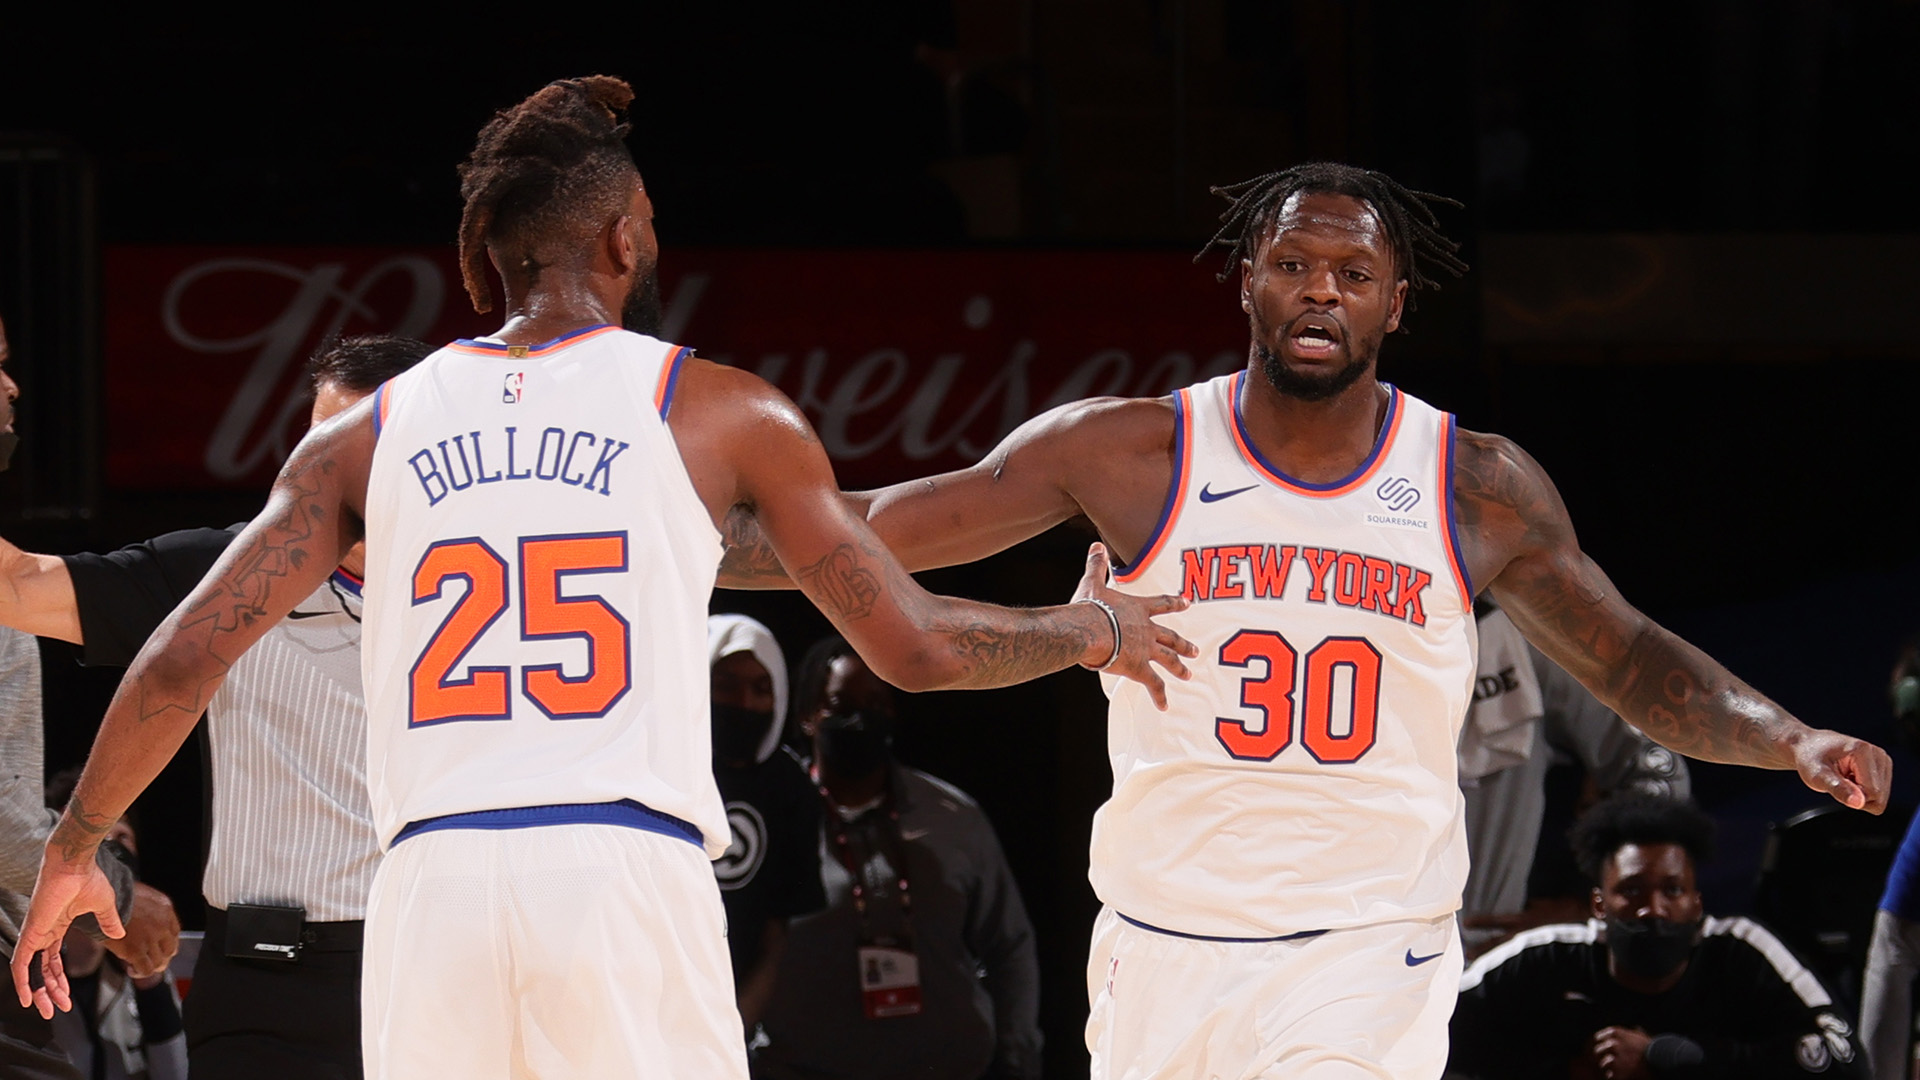 Knicks halt Hawks in OT for 8th straight win; Young hurt